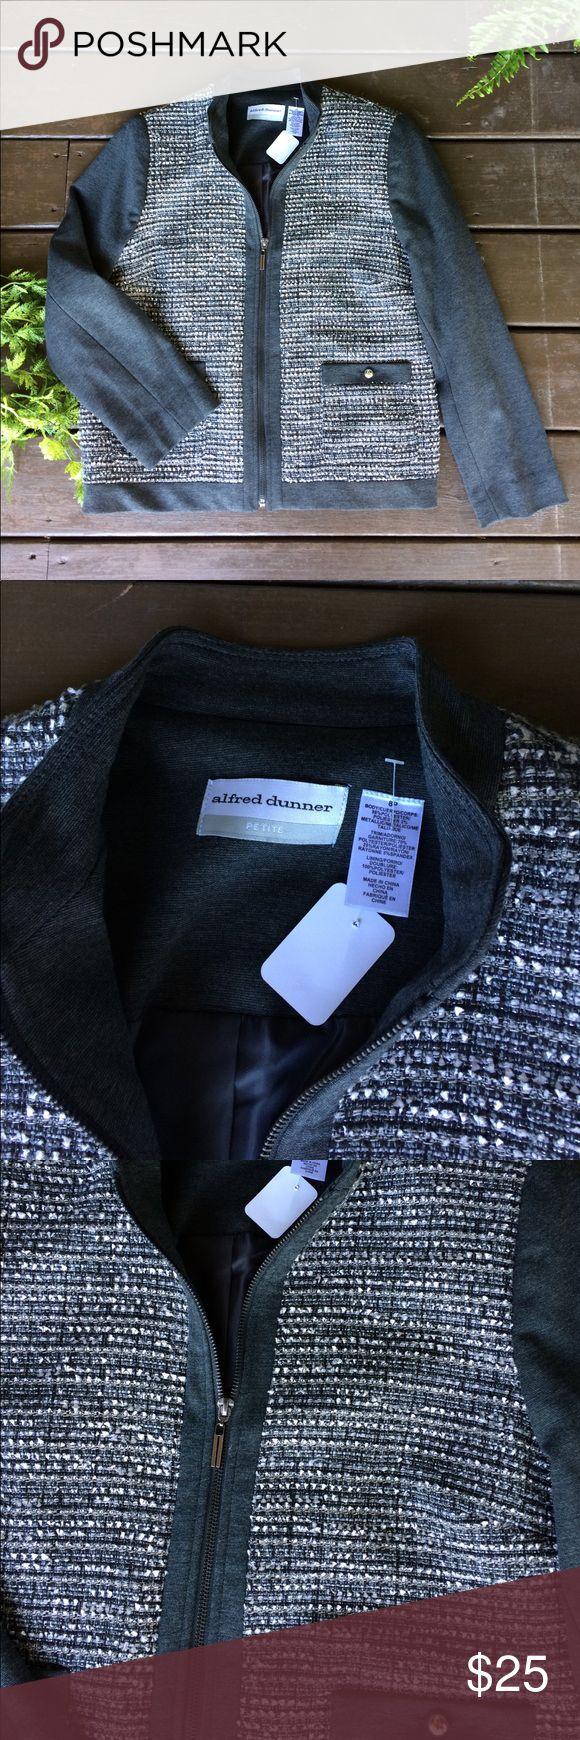 NWT Alfred Dunner petite zip up jacket coat Size 8 petite, pocket in front, lined, zip up Alfred Dunner Jackets & Coats